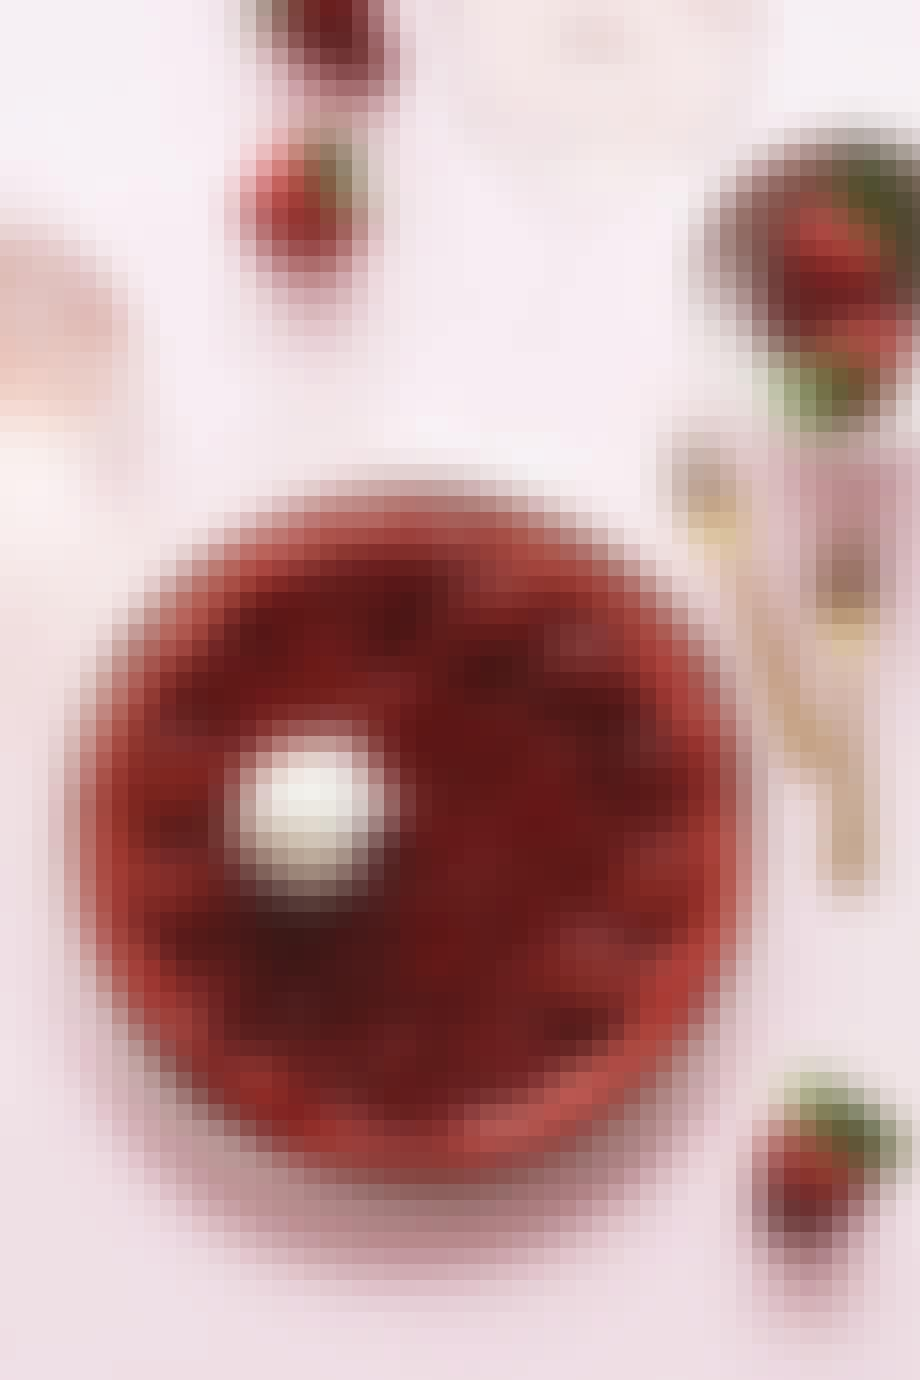 Jærdbær-tarte tatin